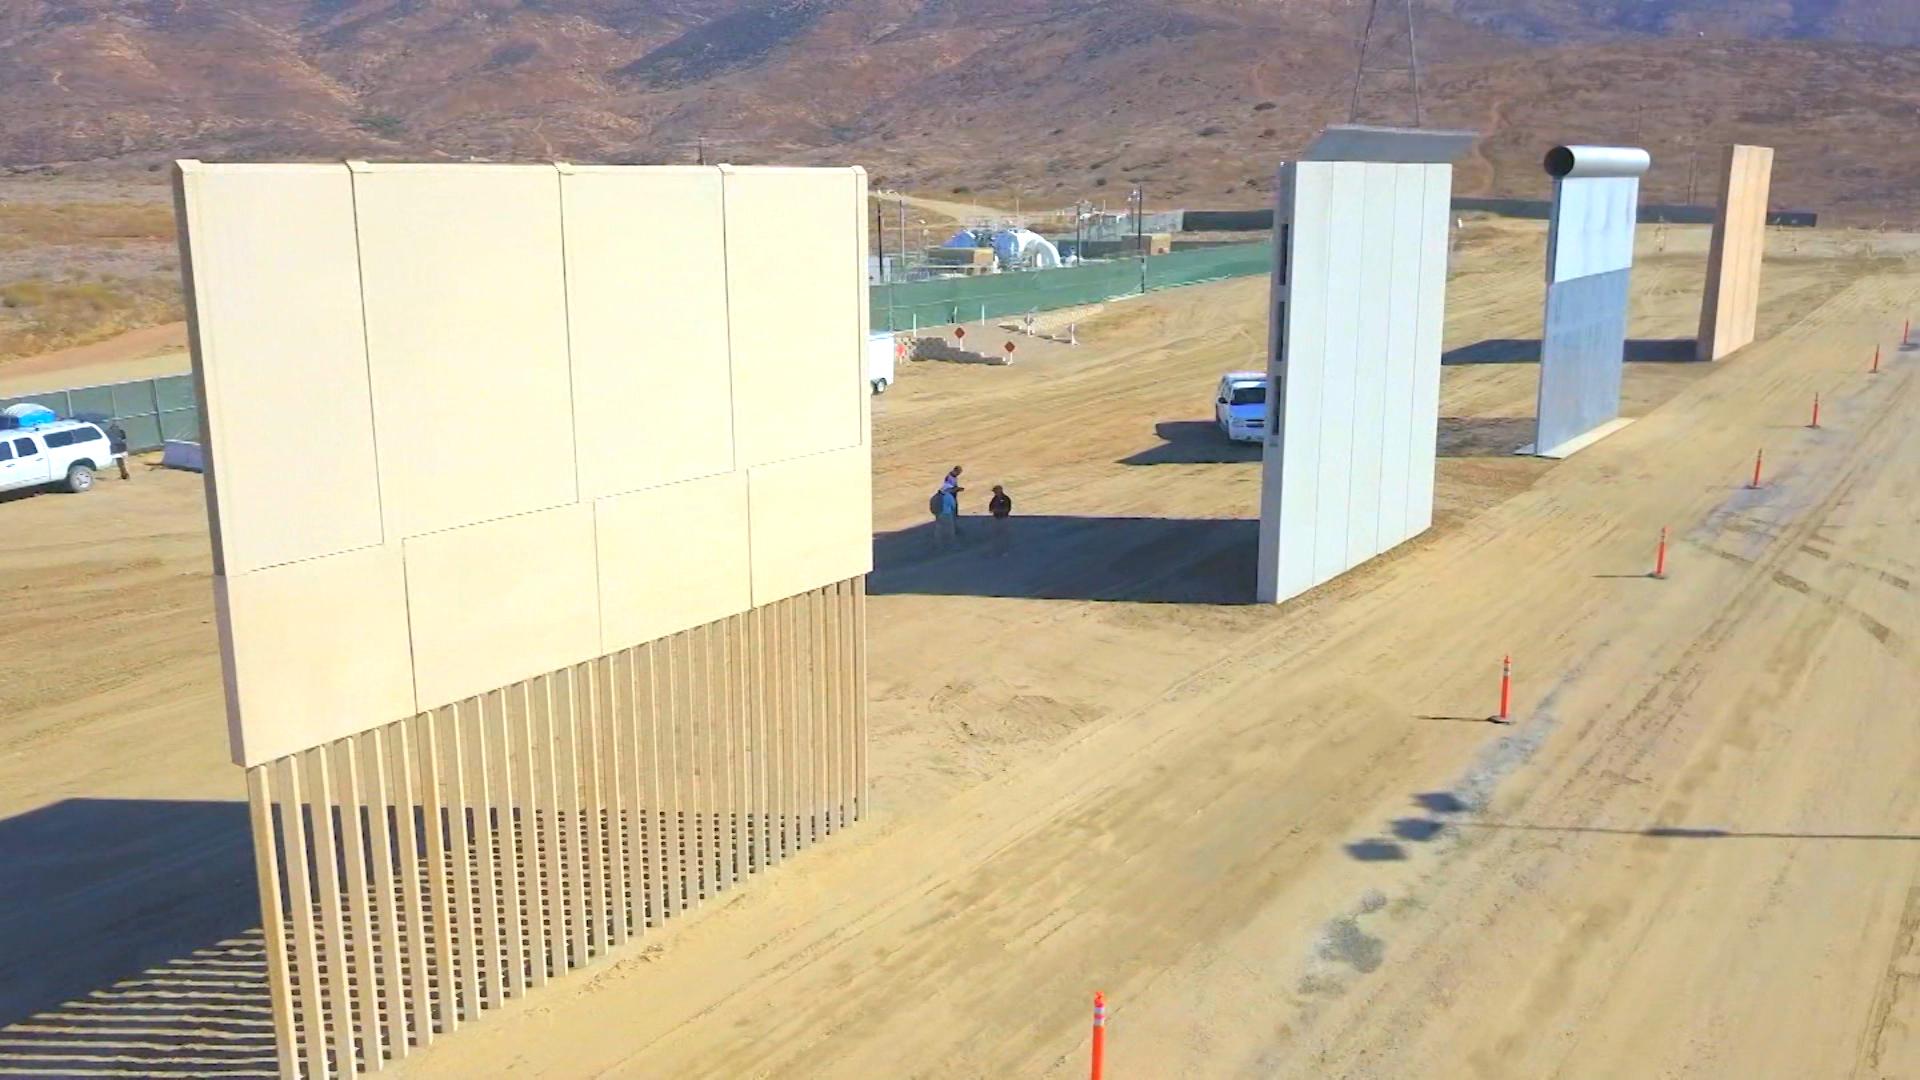 Fact Check: Construction on a new border wall? - CNN Video